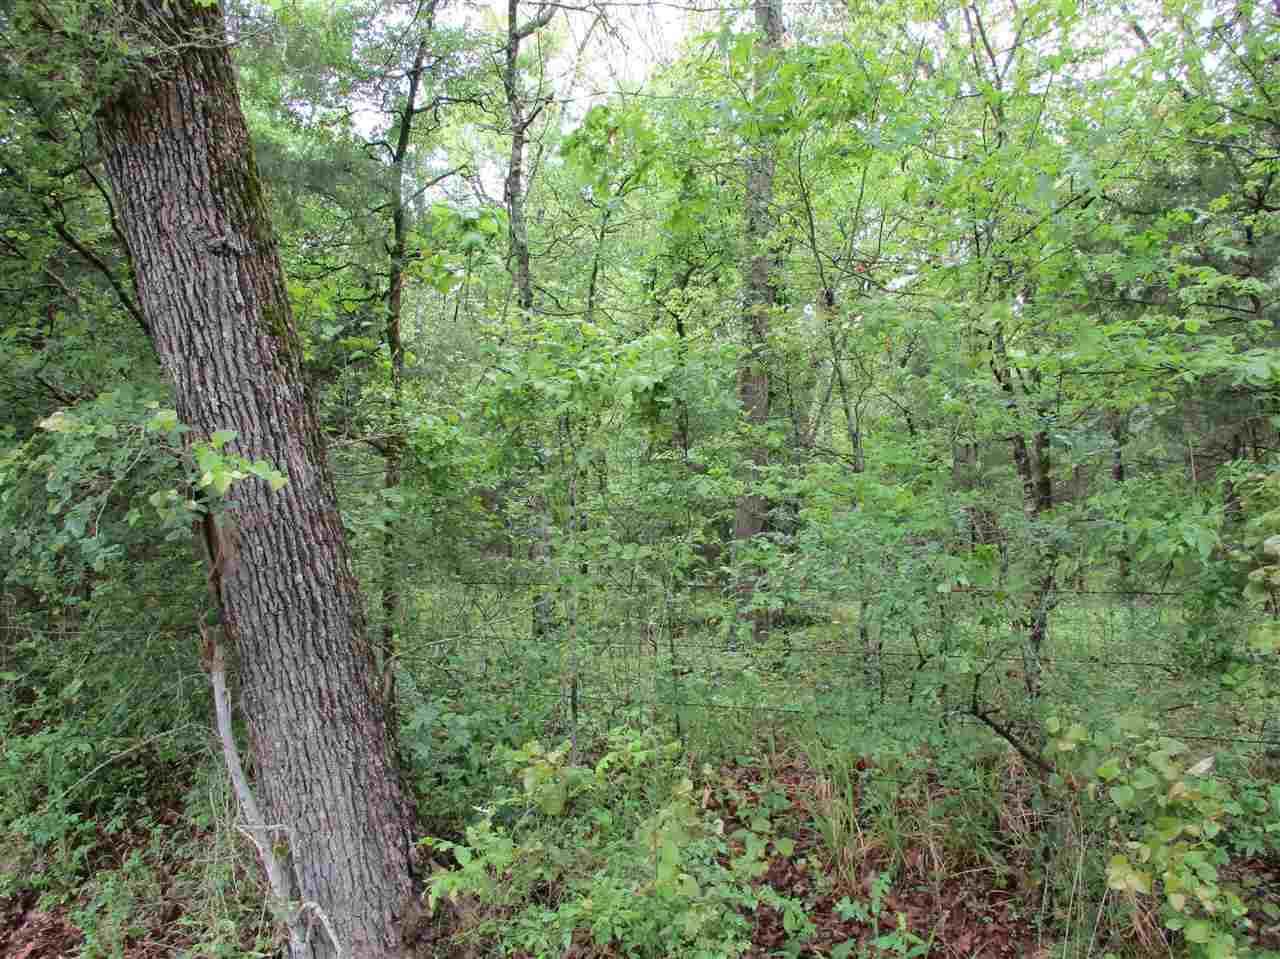 TBD Rains County Road 4525 - Photo 1